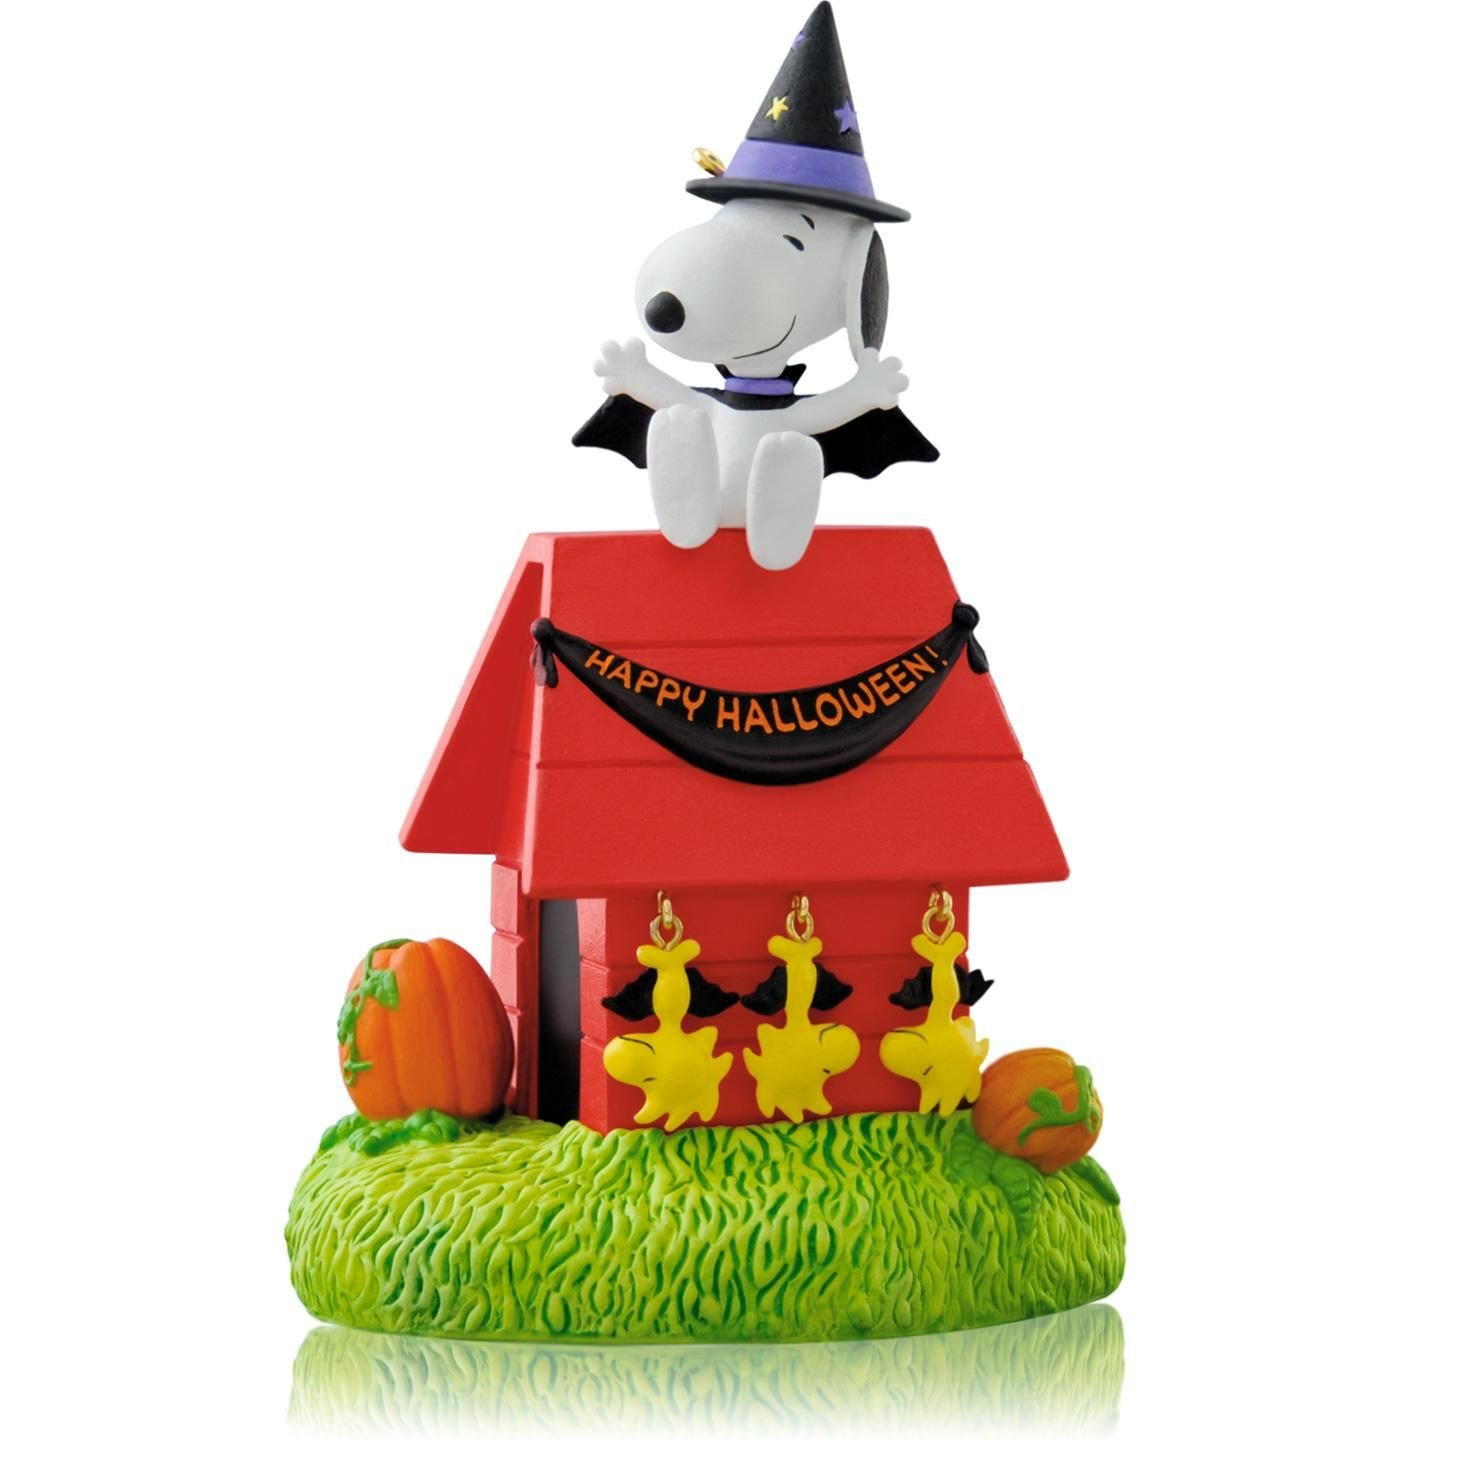 Hangin/' With Count Snoopy 2014 Hallmark Keepsake Ornament QFO5203